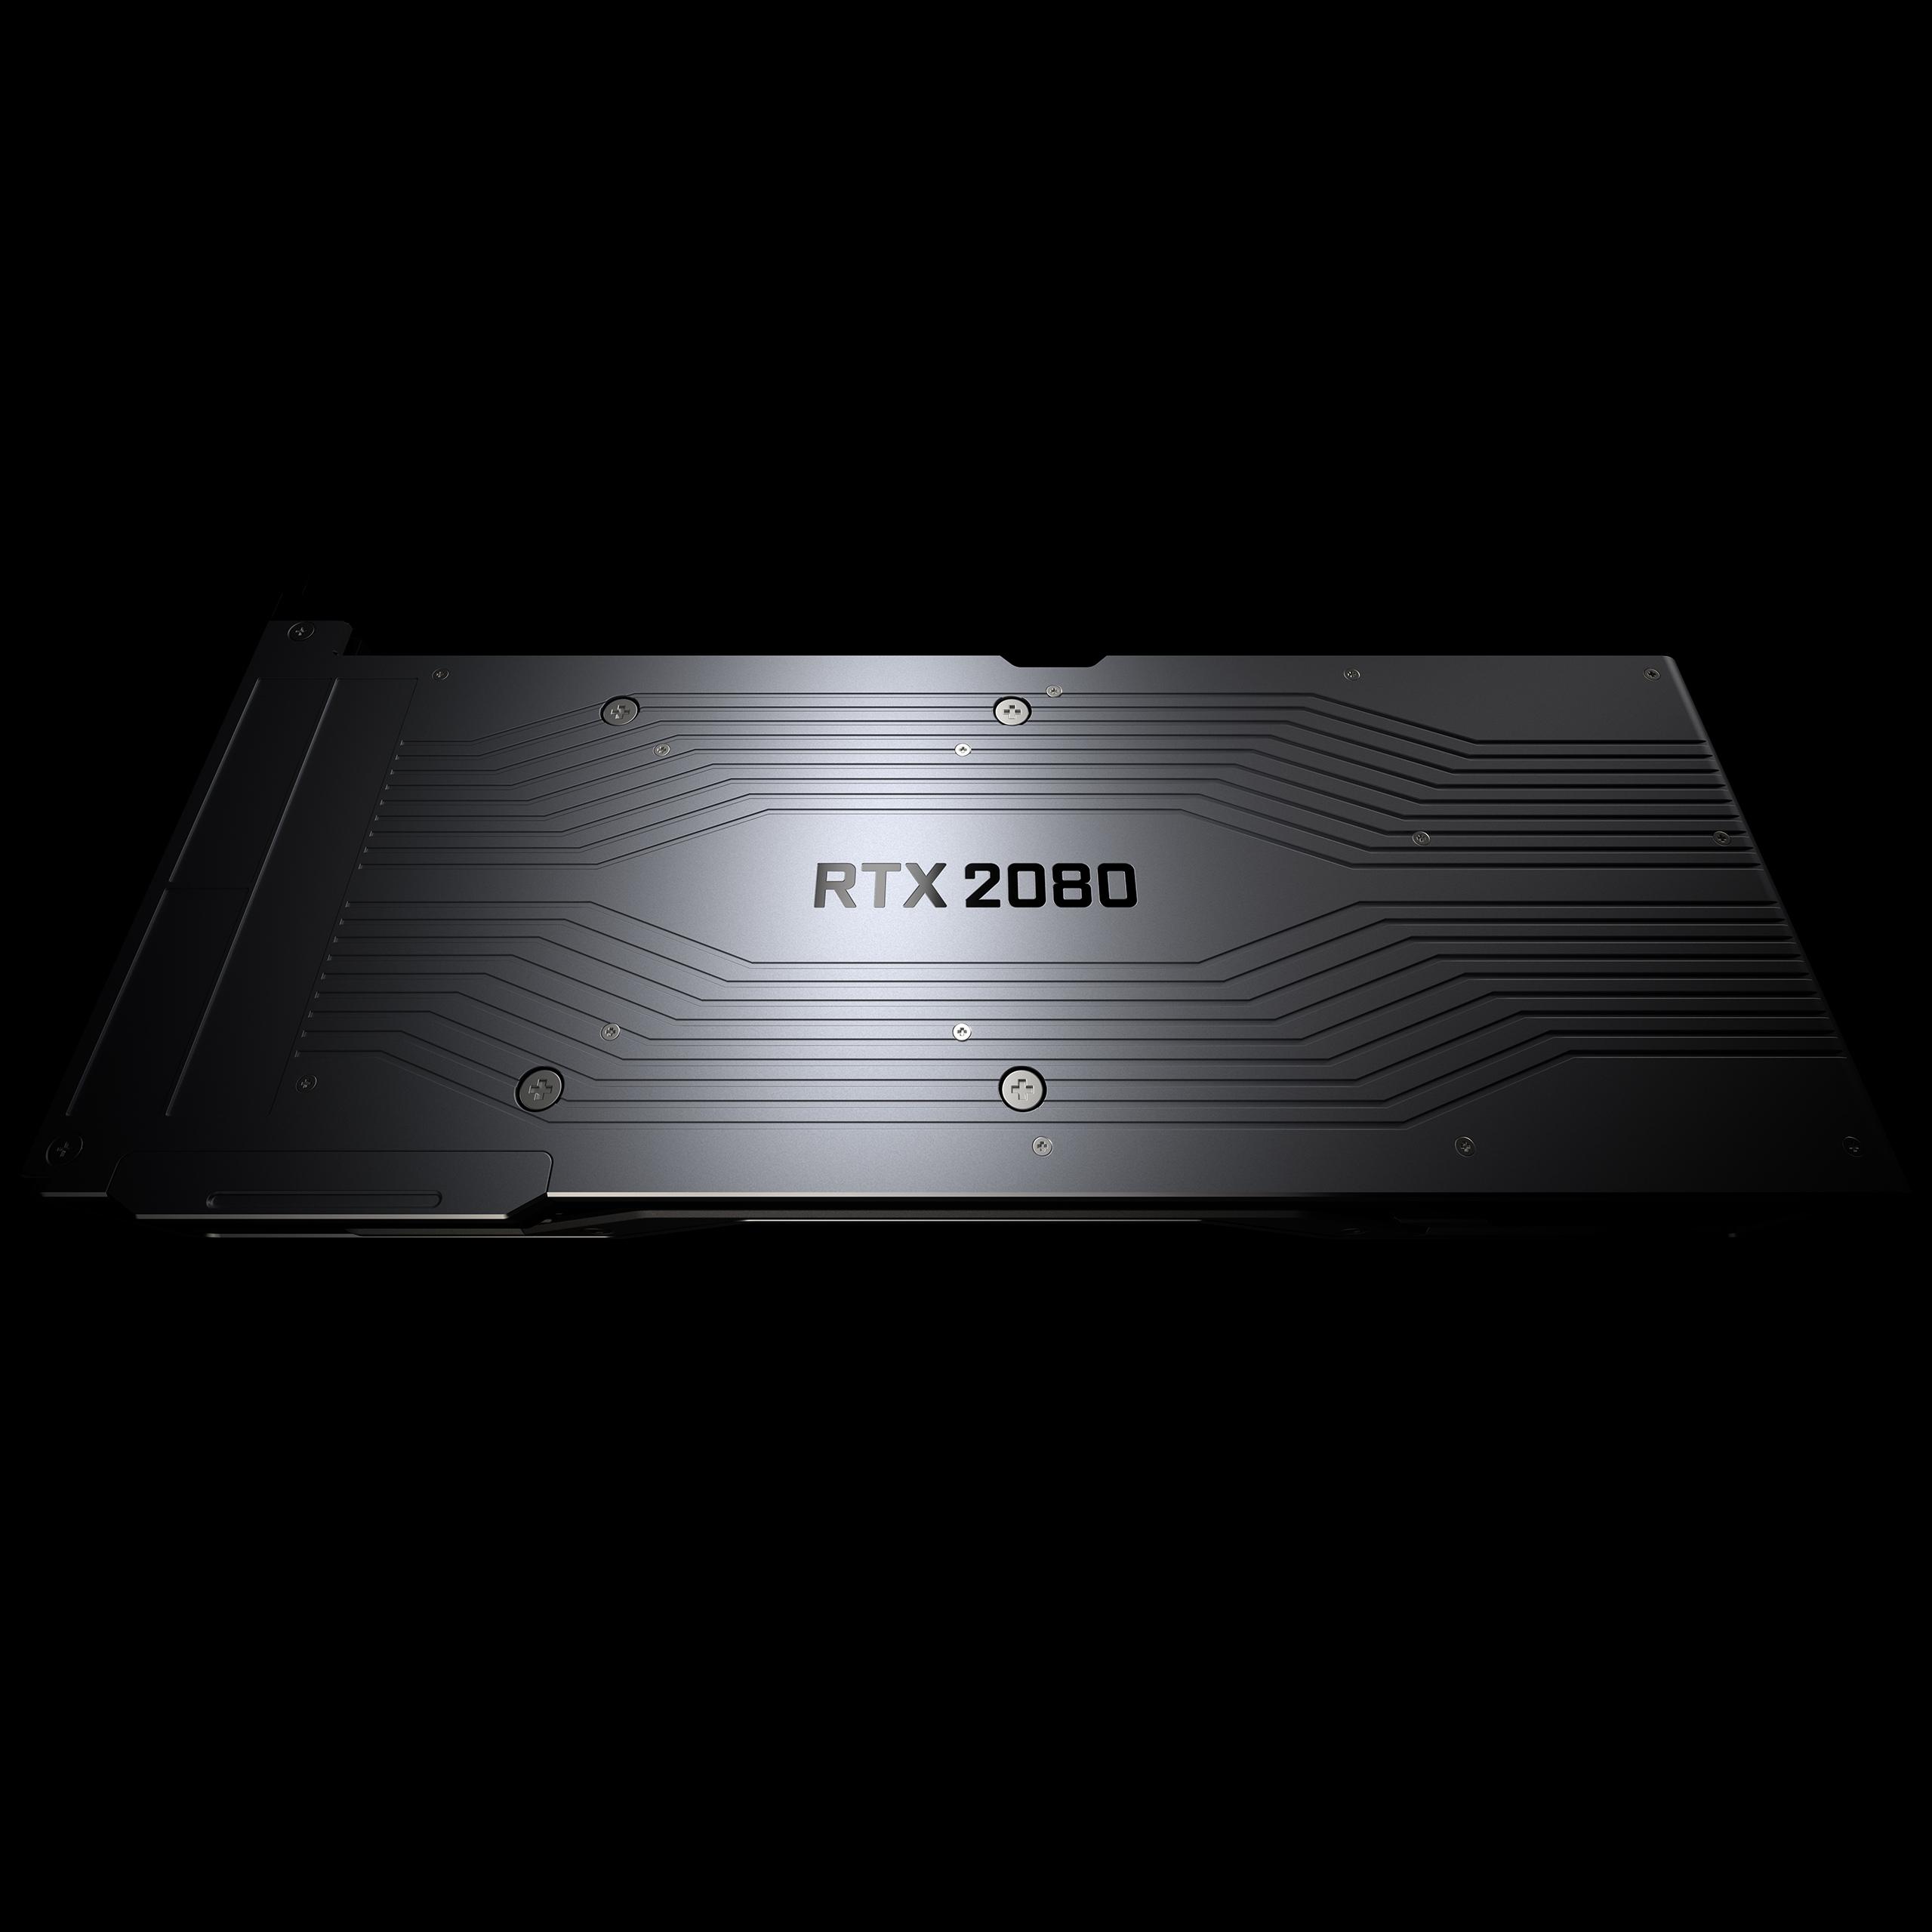 RTX 2080 backplate